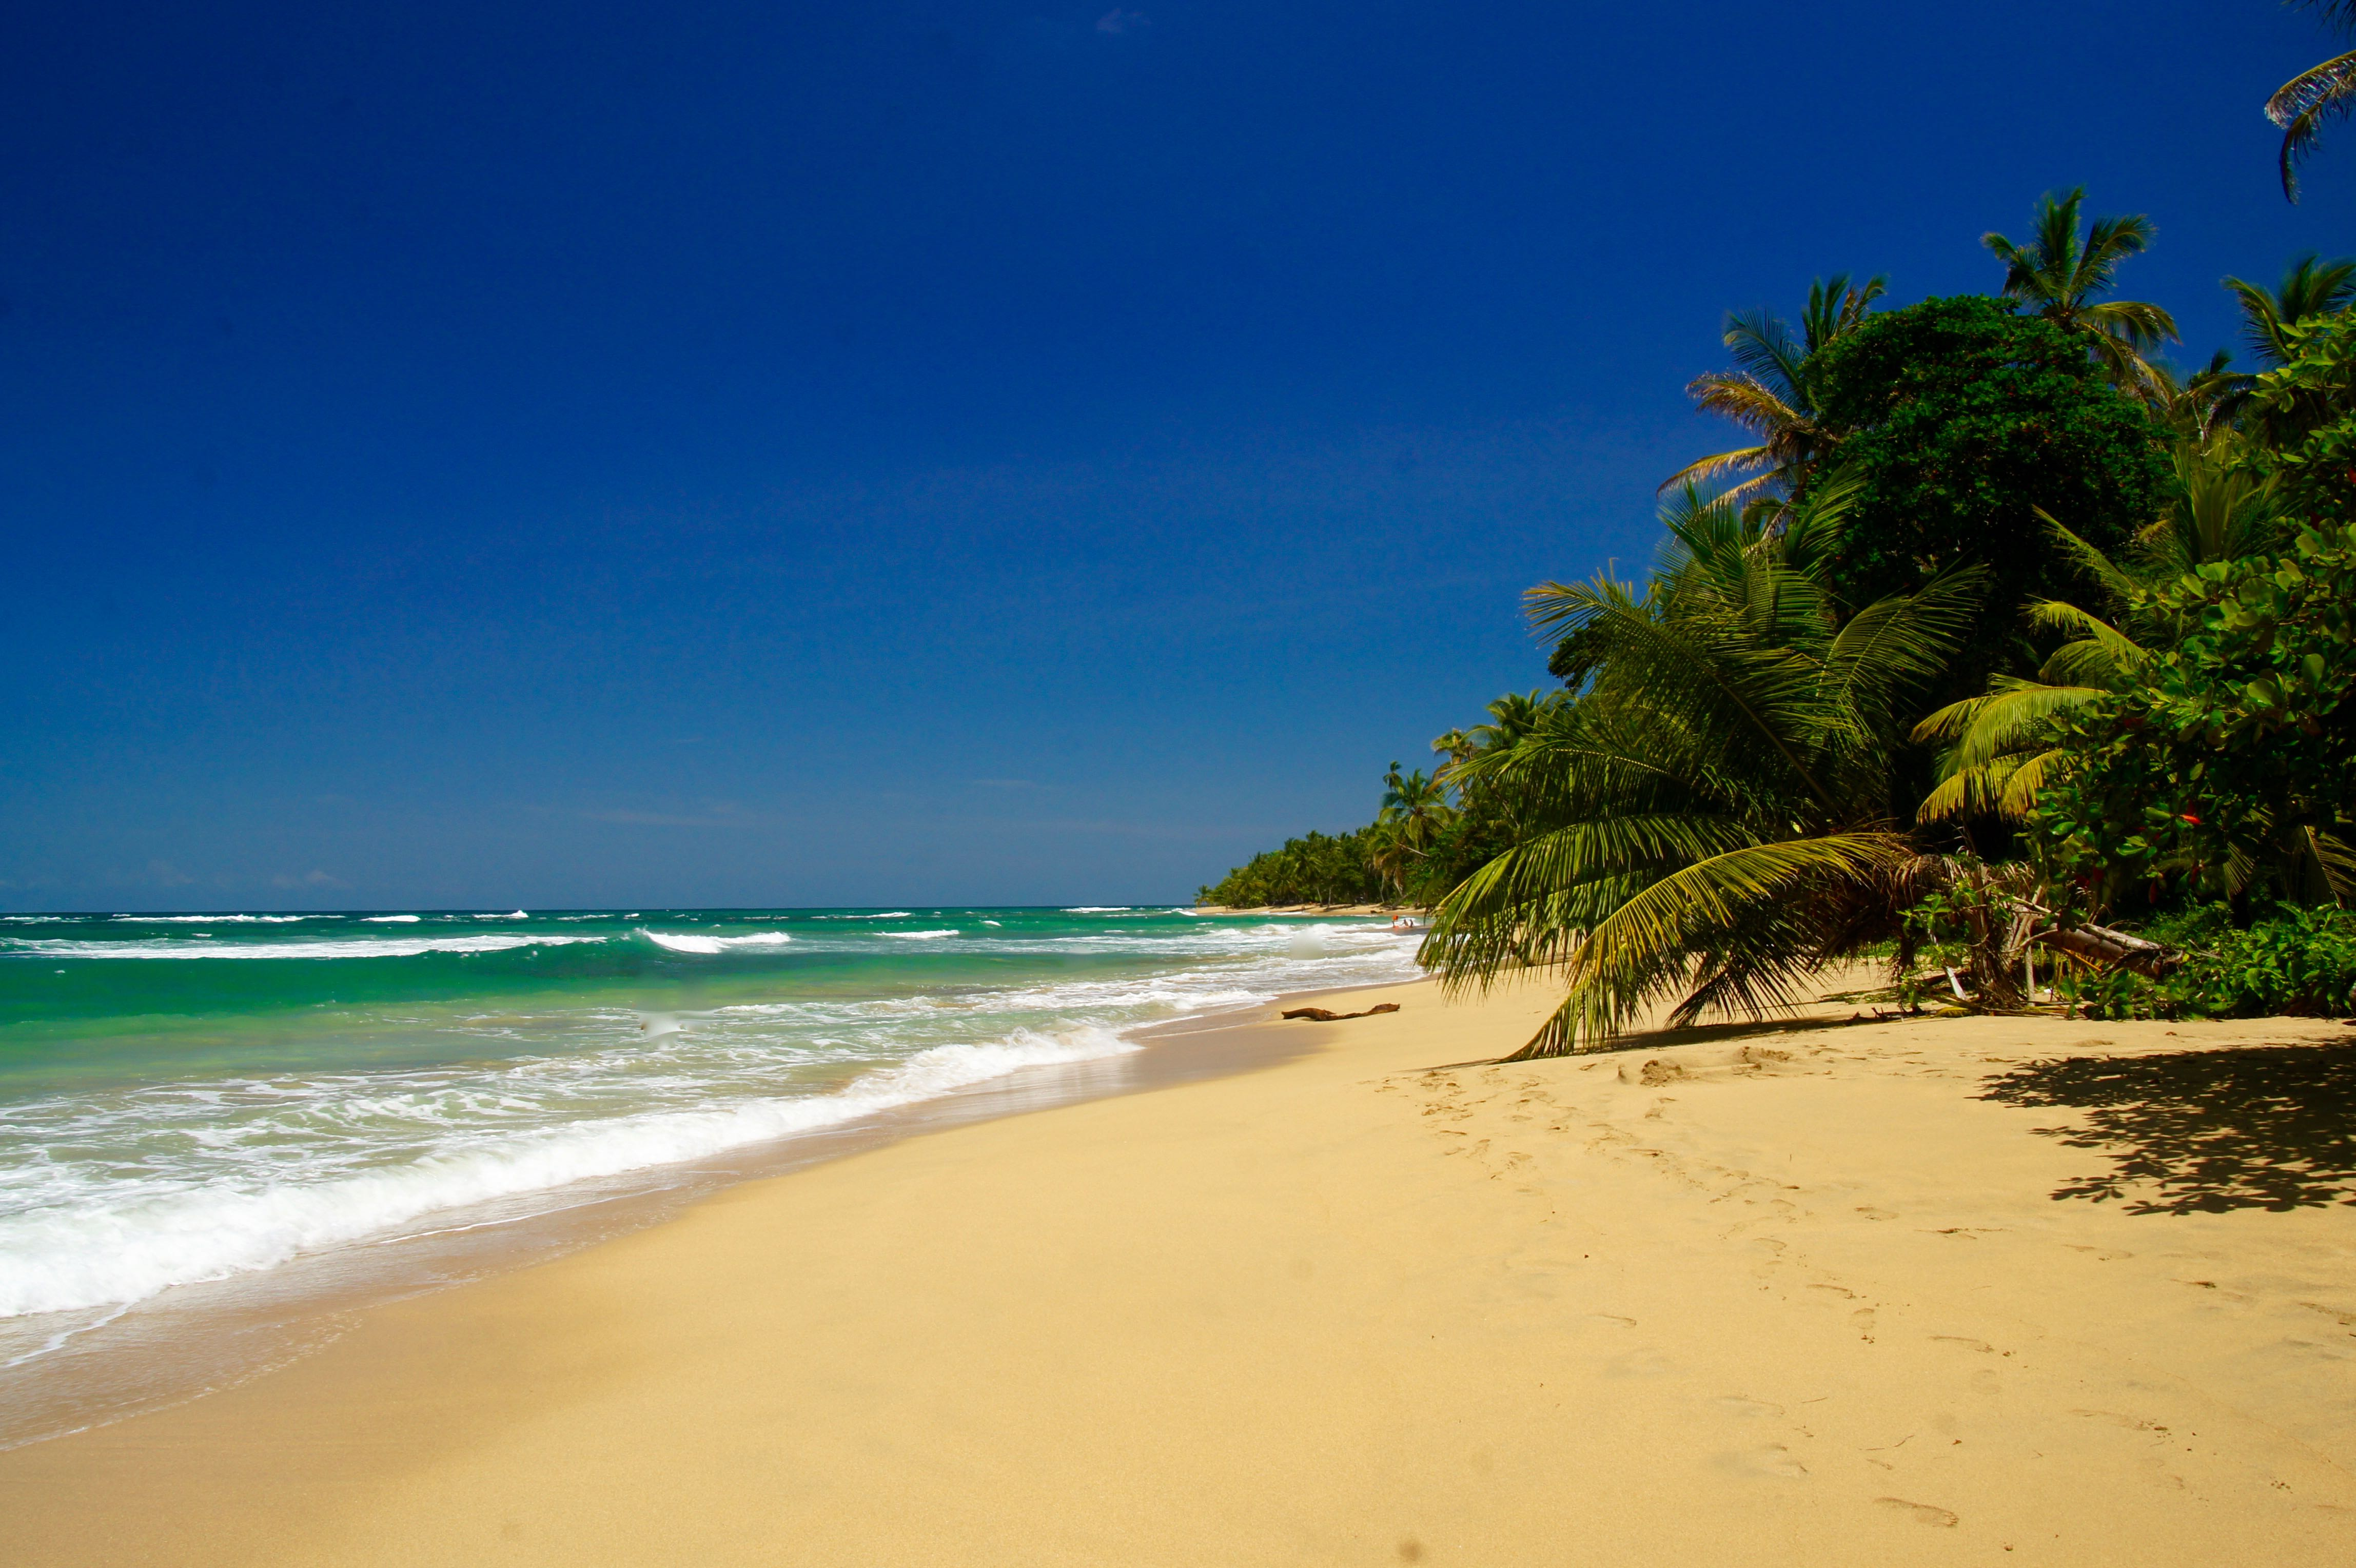 Playa beim El Arrecife